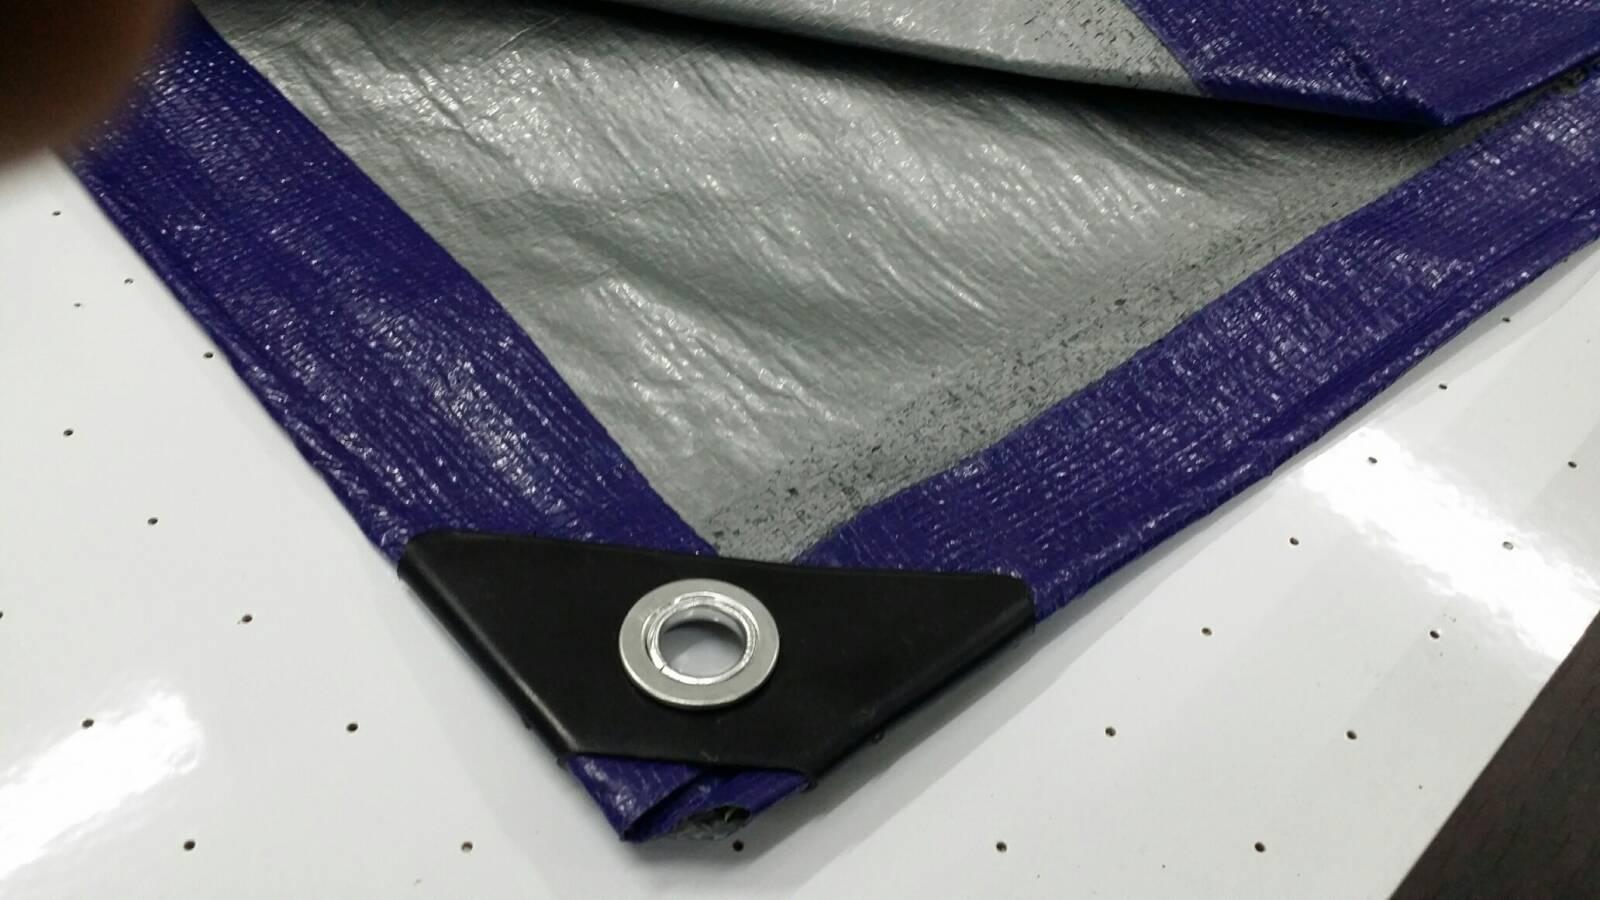 Lona extra reforzada 3x4m (Heavy Duty) impermeable y multiuso